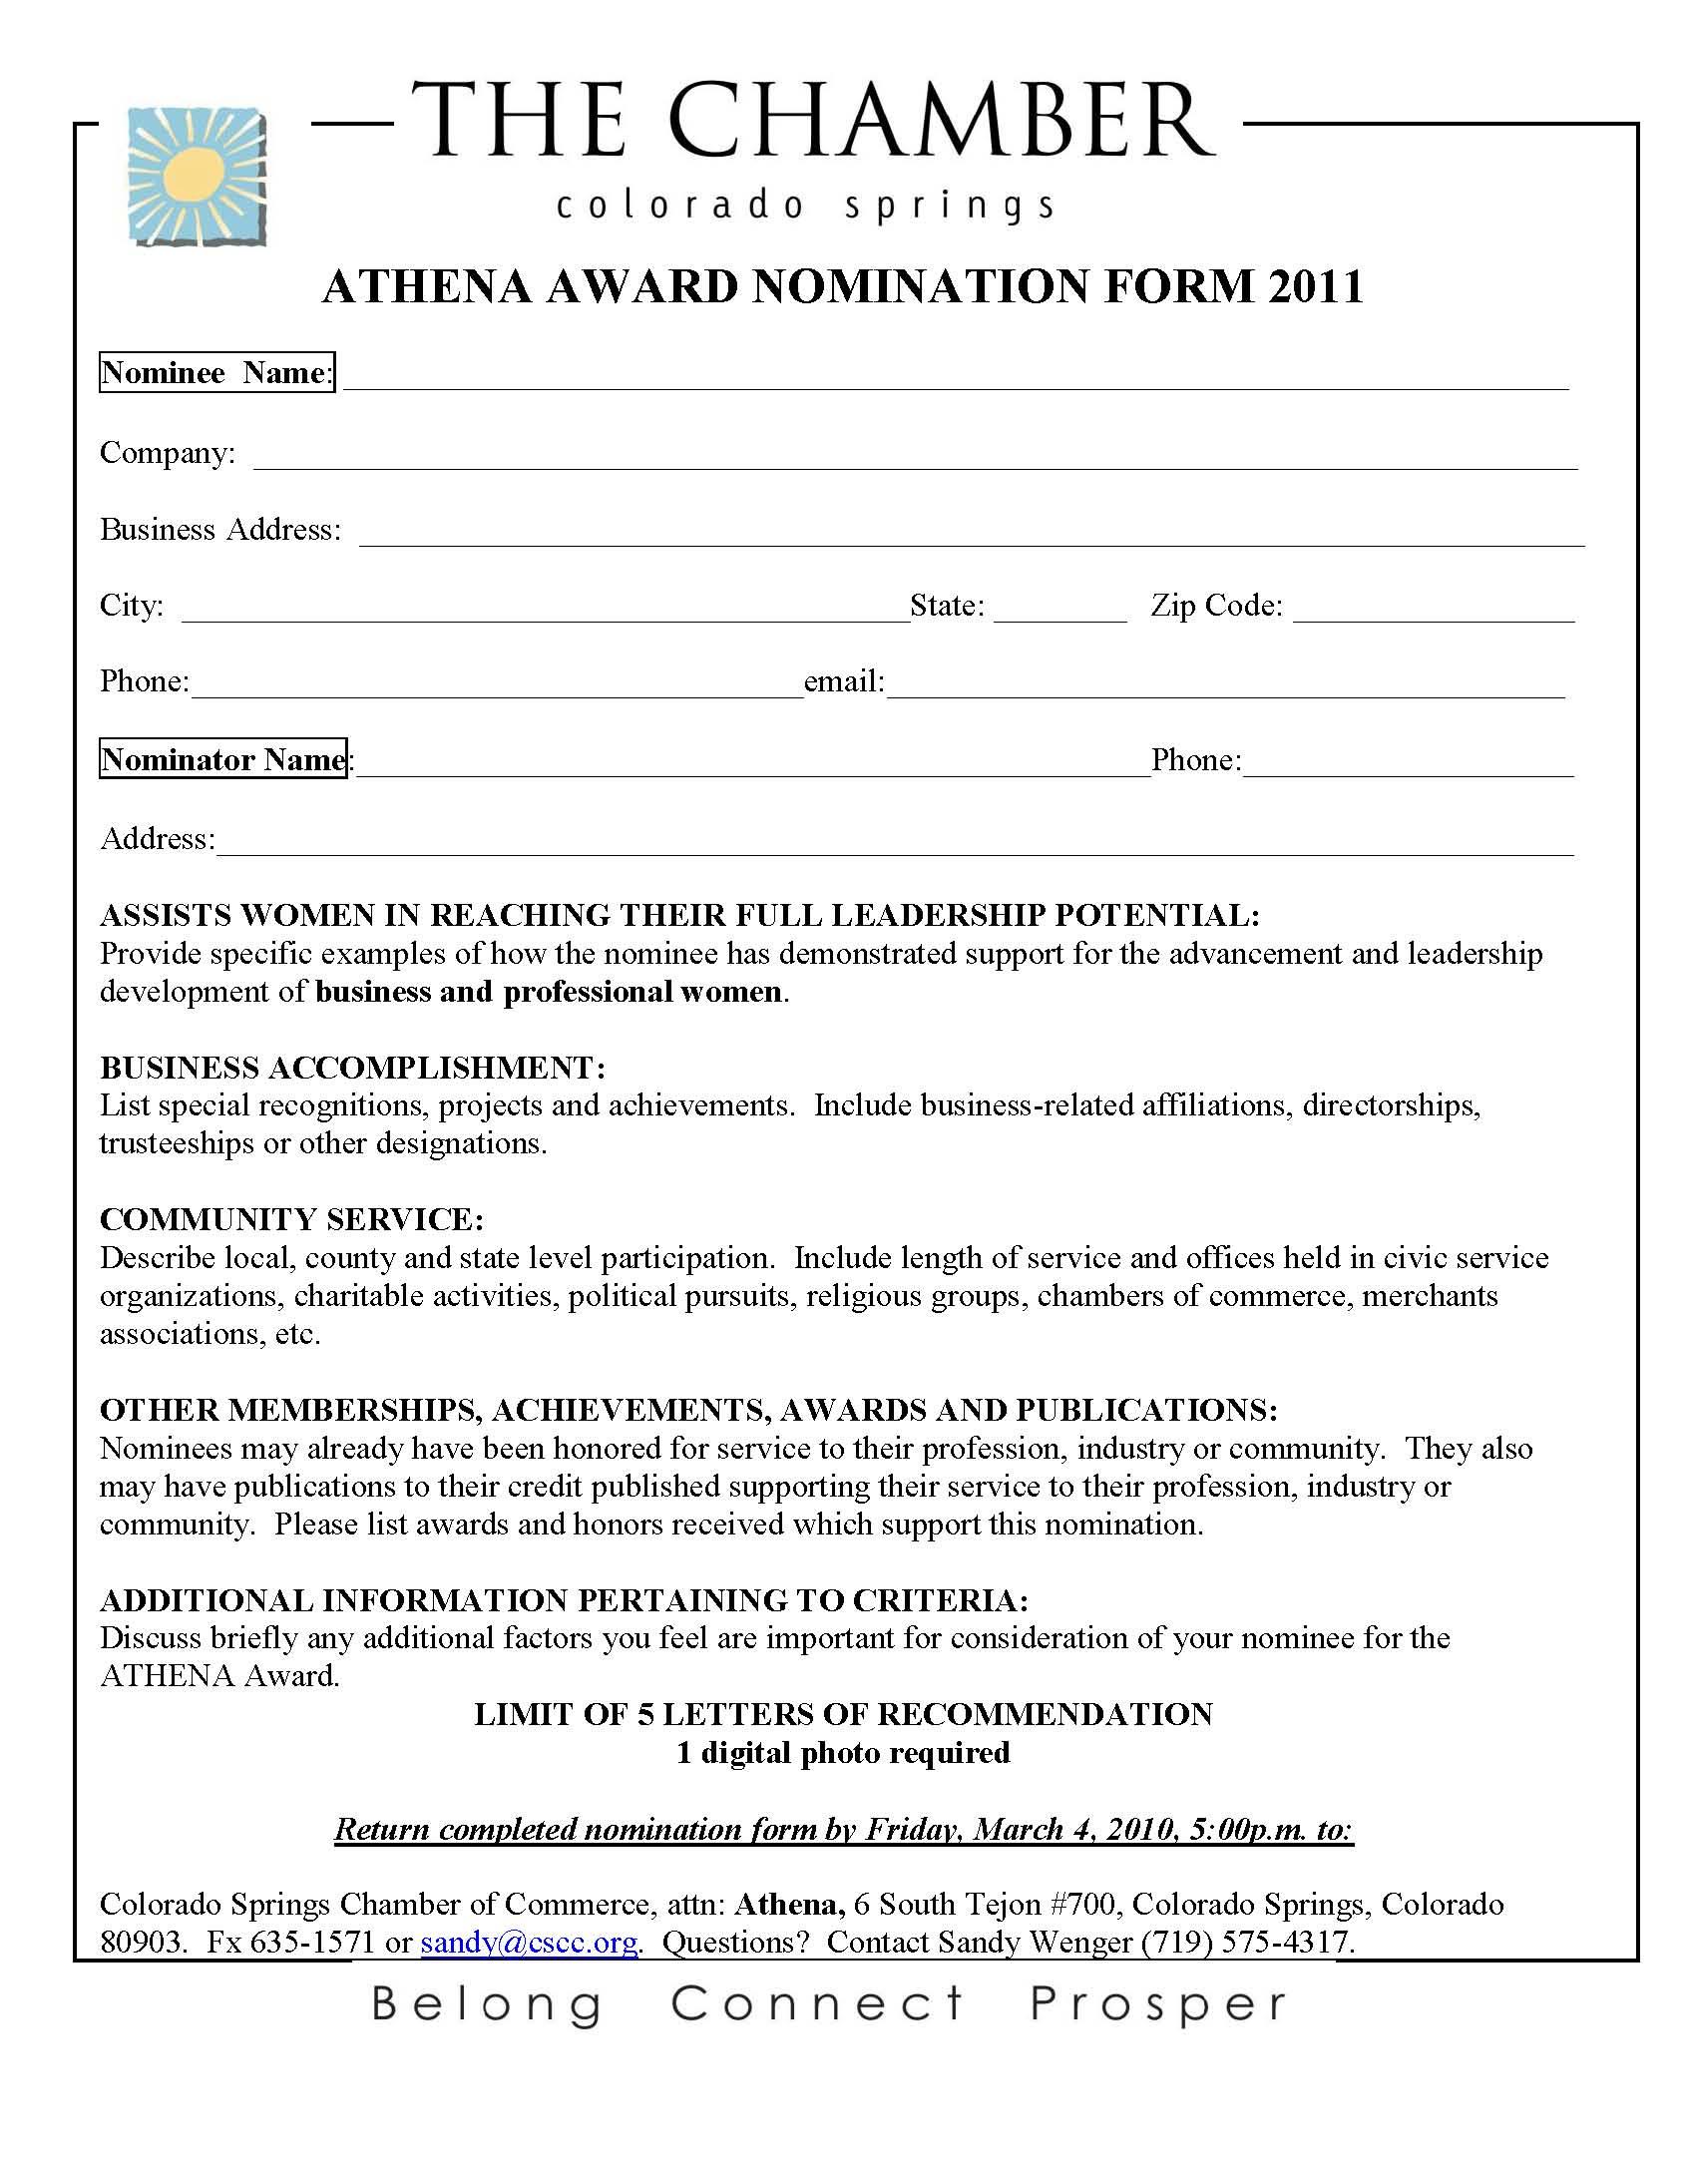 Athena Nomination Form 2011